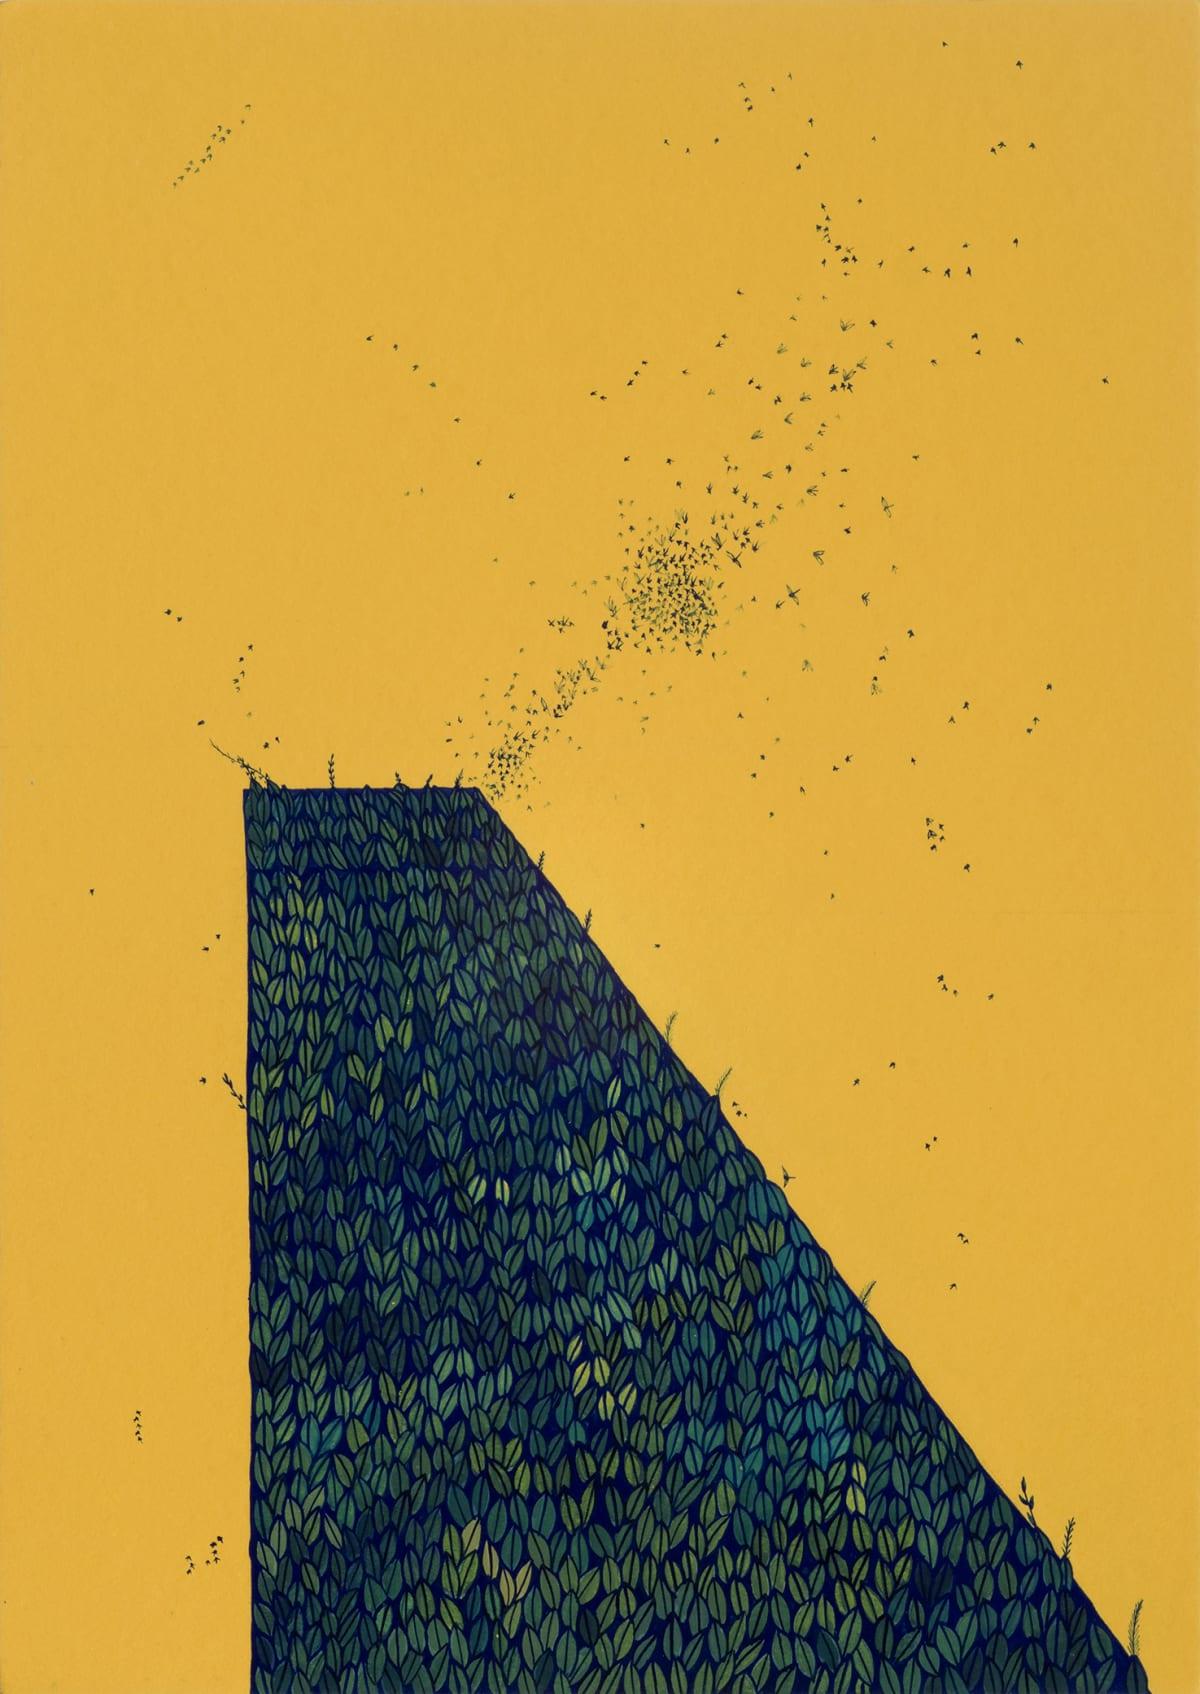 Wardha Shabbir b. 1987Territory, 2020 Gouache on paper 29 x 25.6 cm 11 3/8 x 10 1/8 in